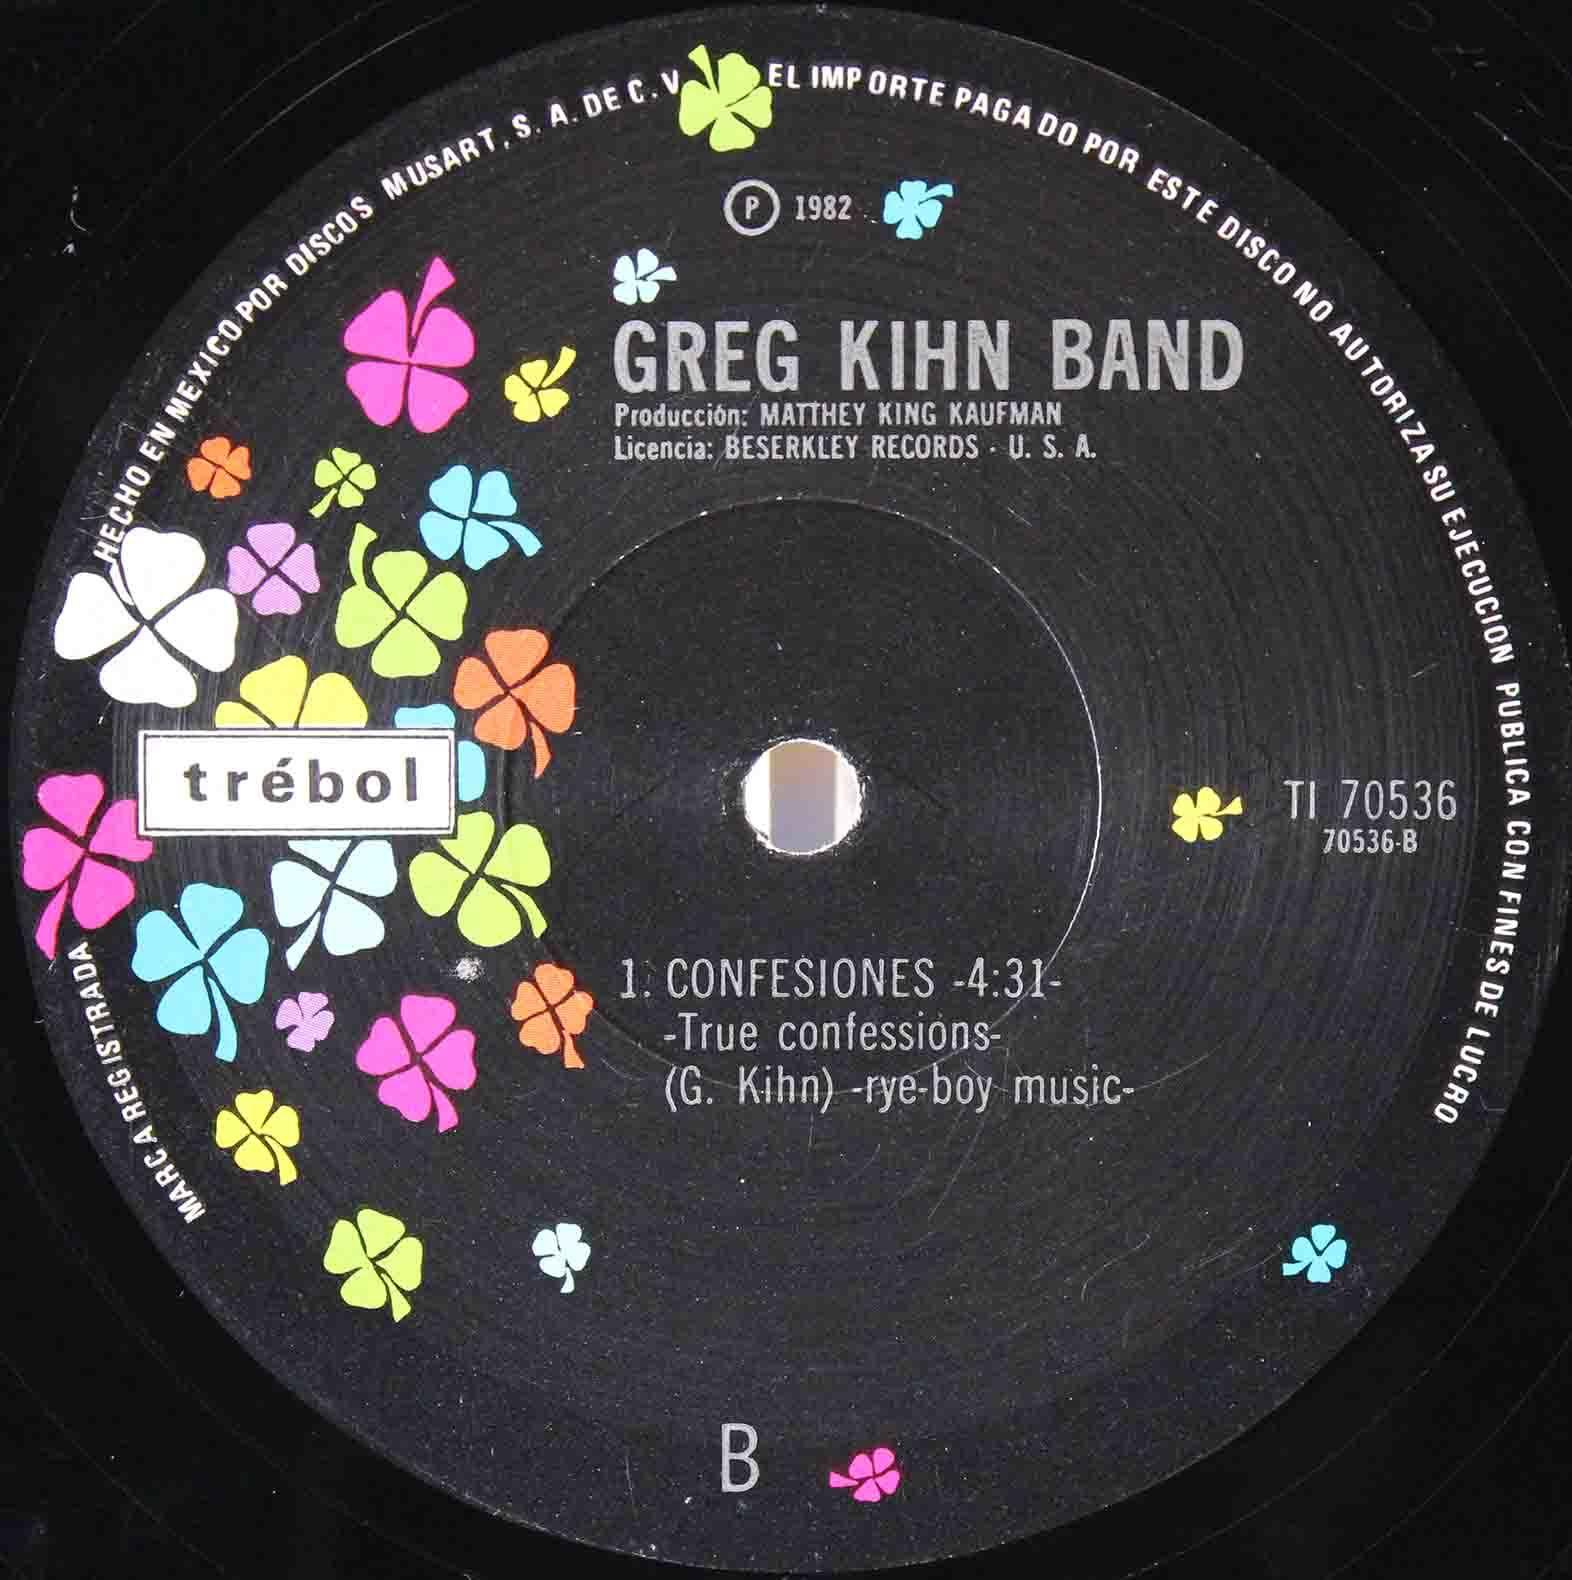 Greg Kihn Band – The Breakup Song 04